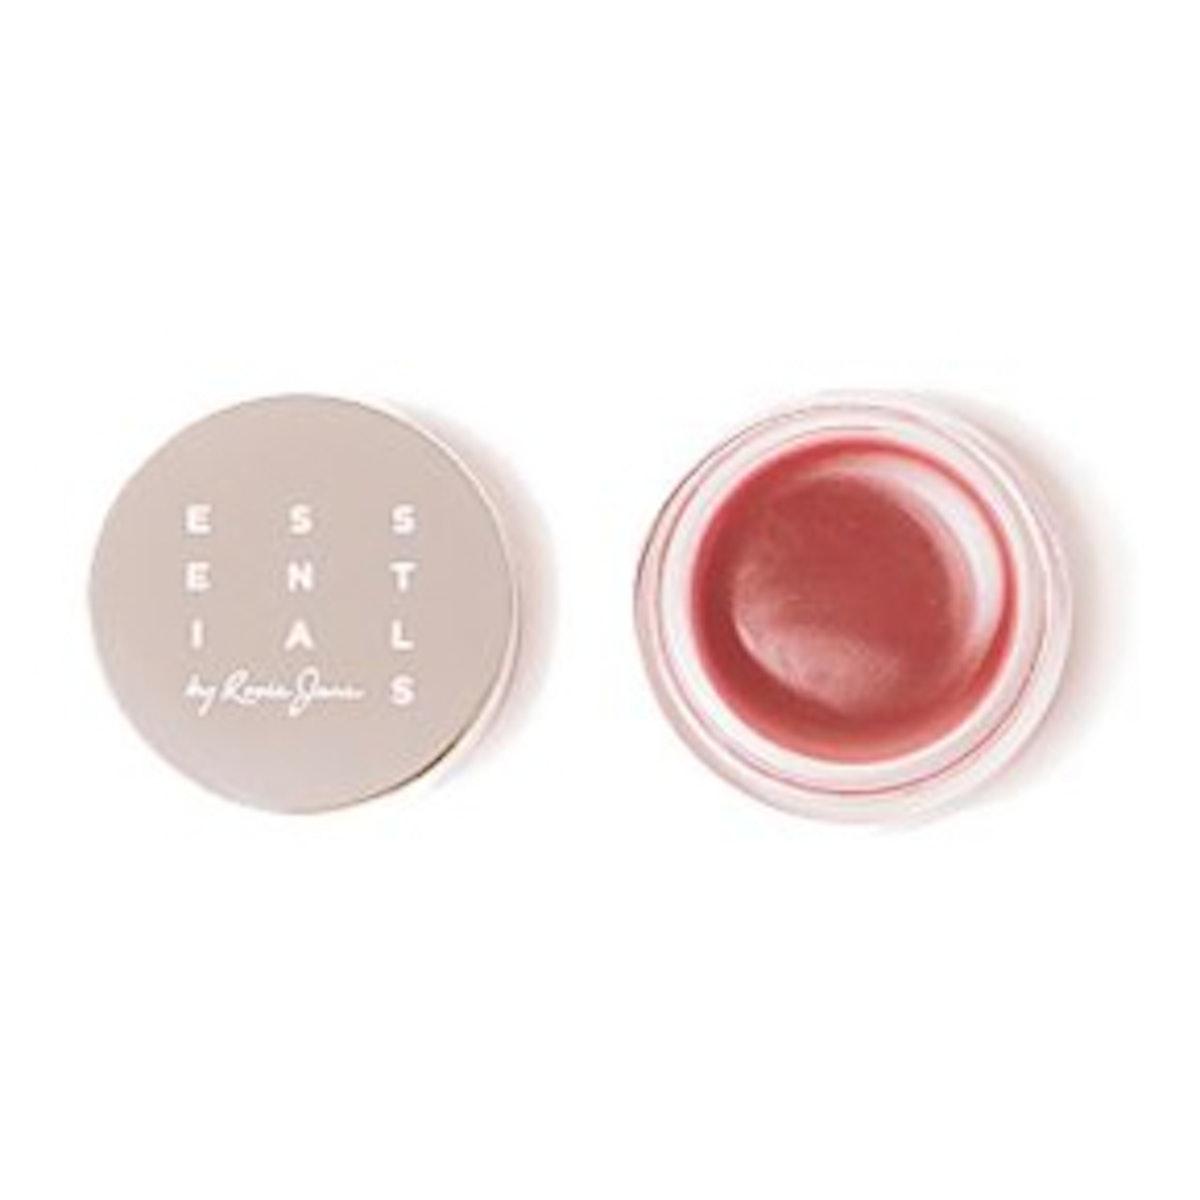 Essentials Cheek and Lip Gloss in Poppy